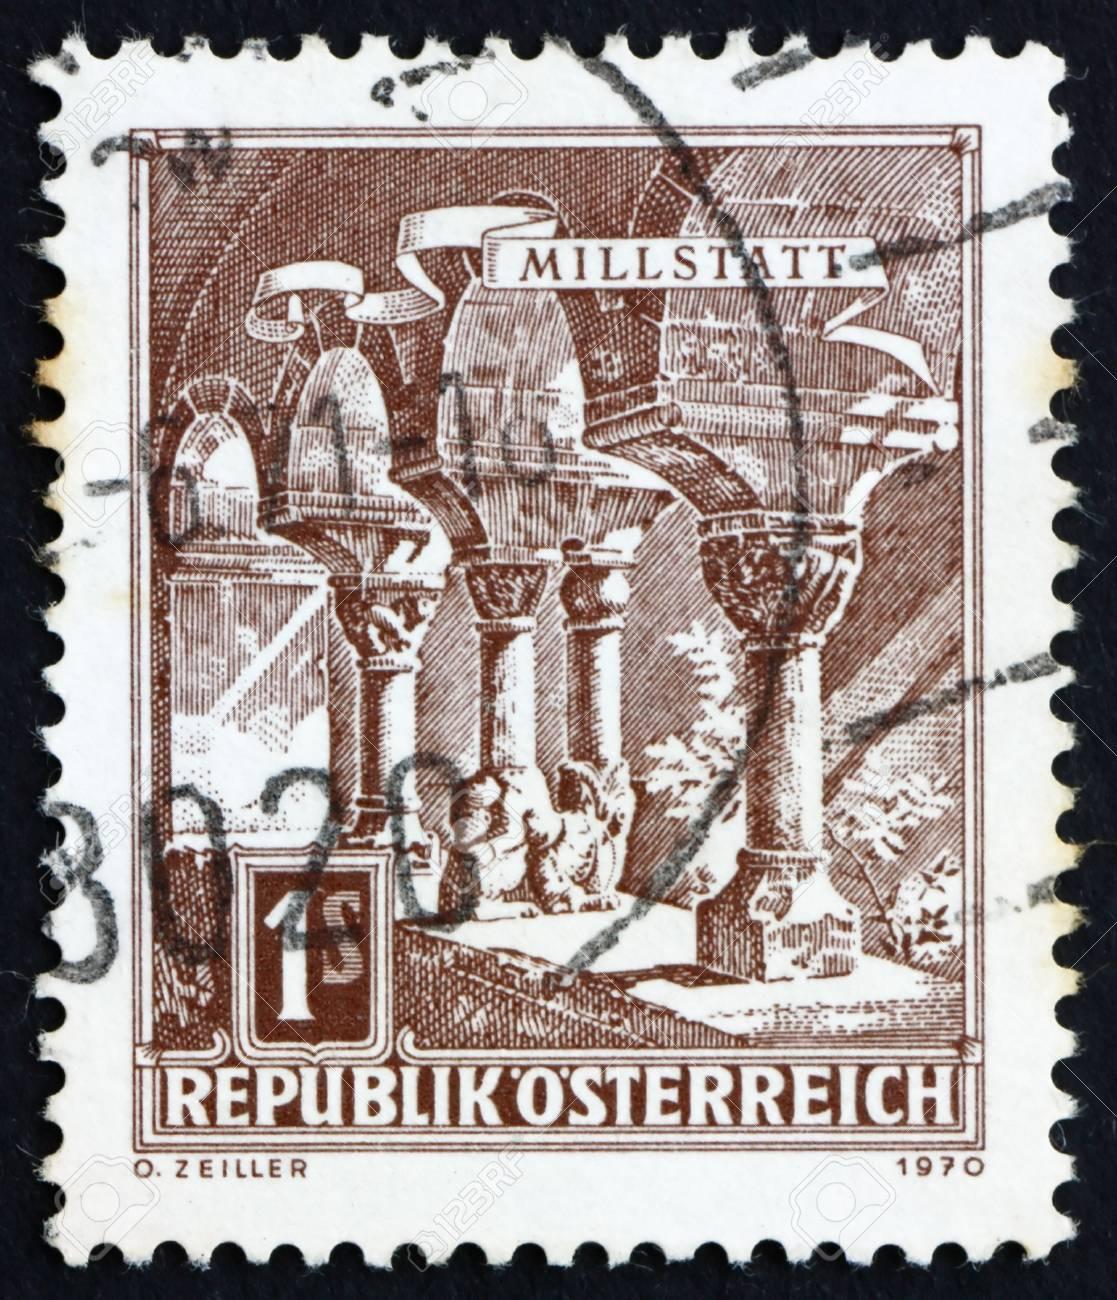 AUSTRIA - CIRCA 1970: a stamp printed in the Austria shows Romanesque Columns, Millstatt Abbey, circa 1970 Stock Photo - 16284395